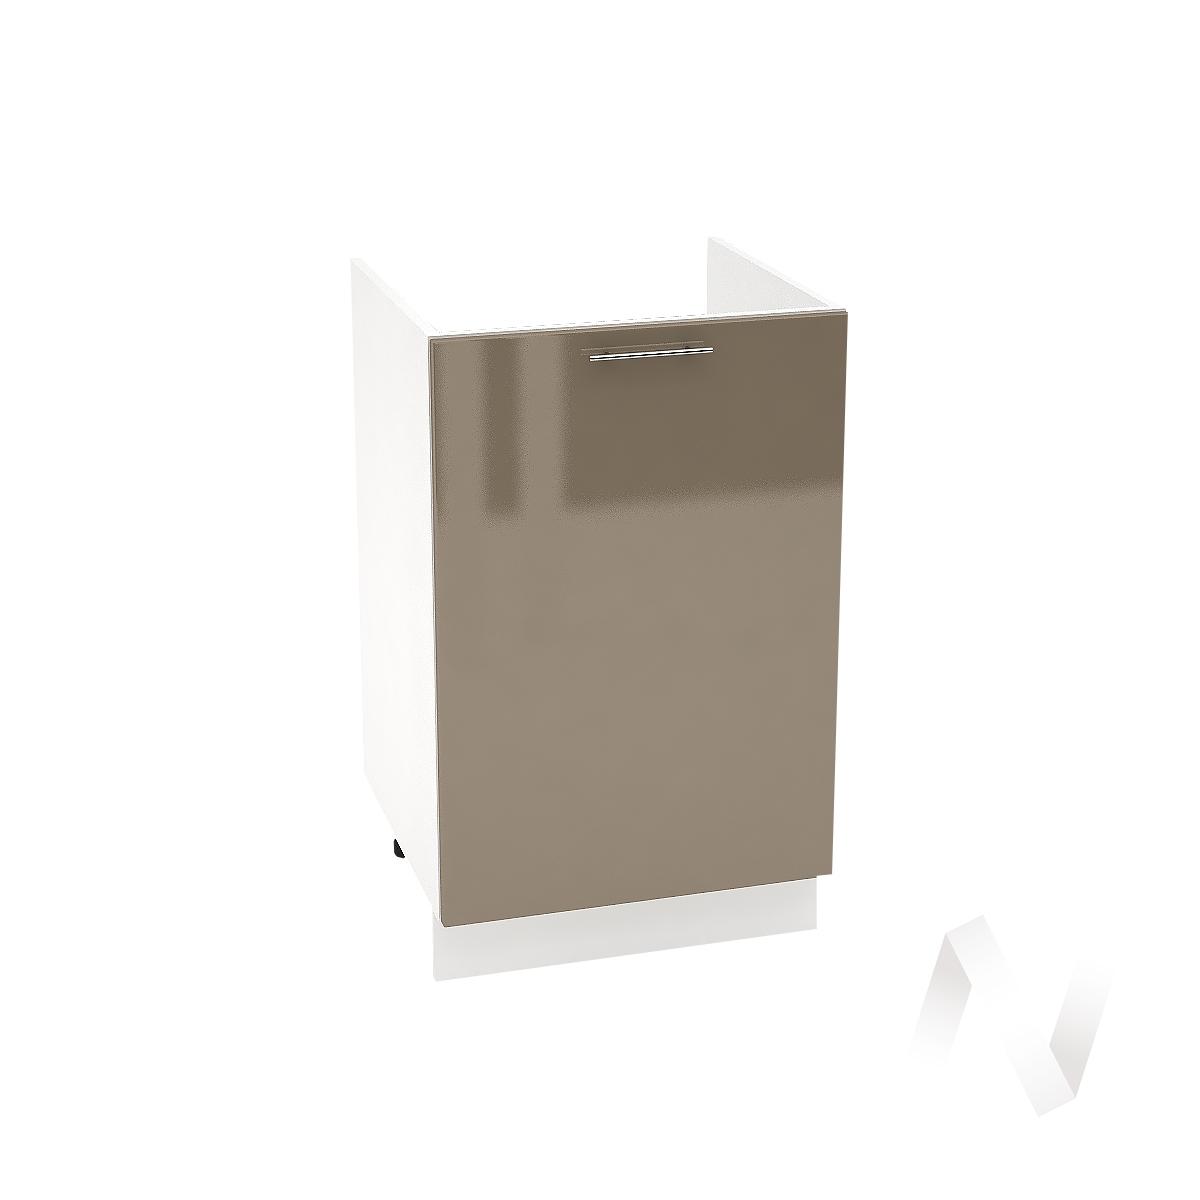 "Кухня ""Валерия-М"": Шкаф нижний под мойку 500, ШНМ 500 (Капучино глянец/корпус белый)"